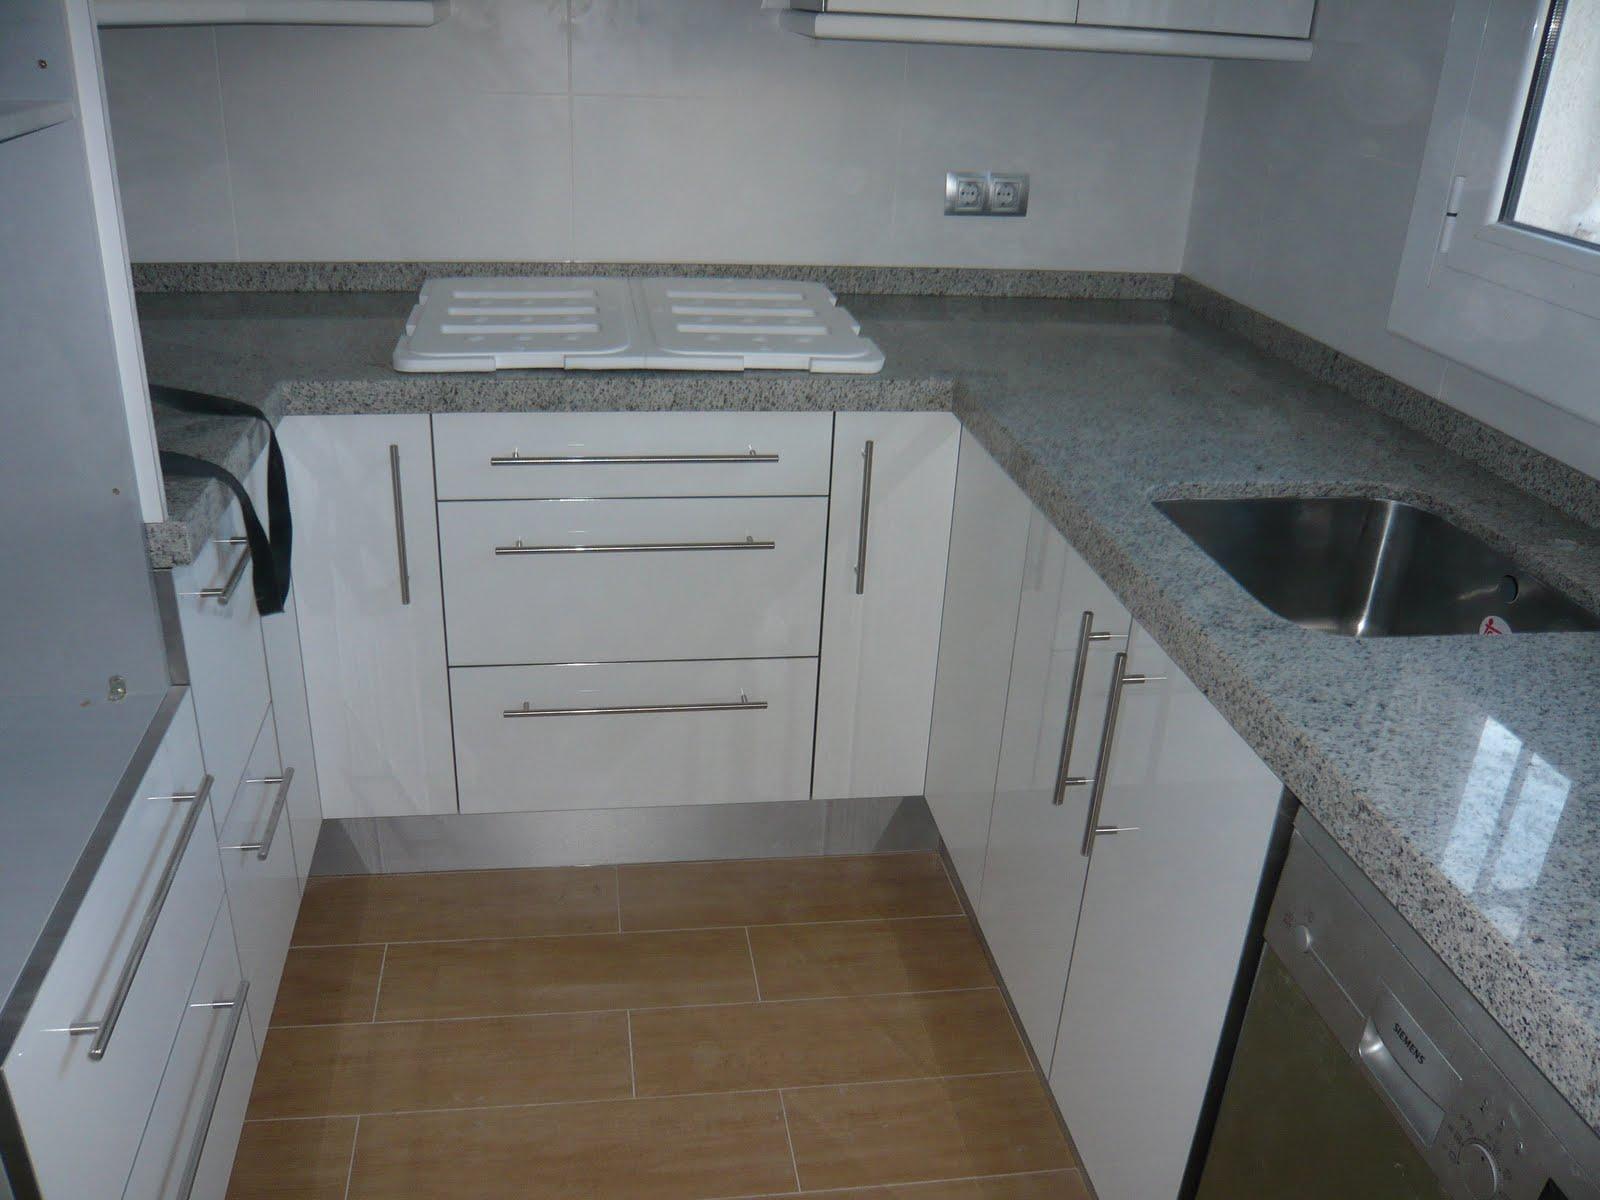 Reuscuina cocina blanco brillo - Cocinas blanco brillo ...